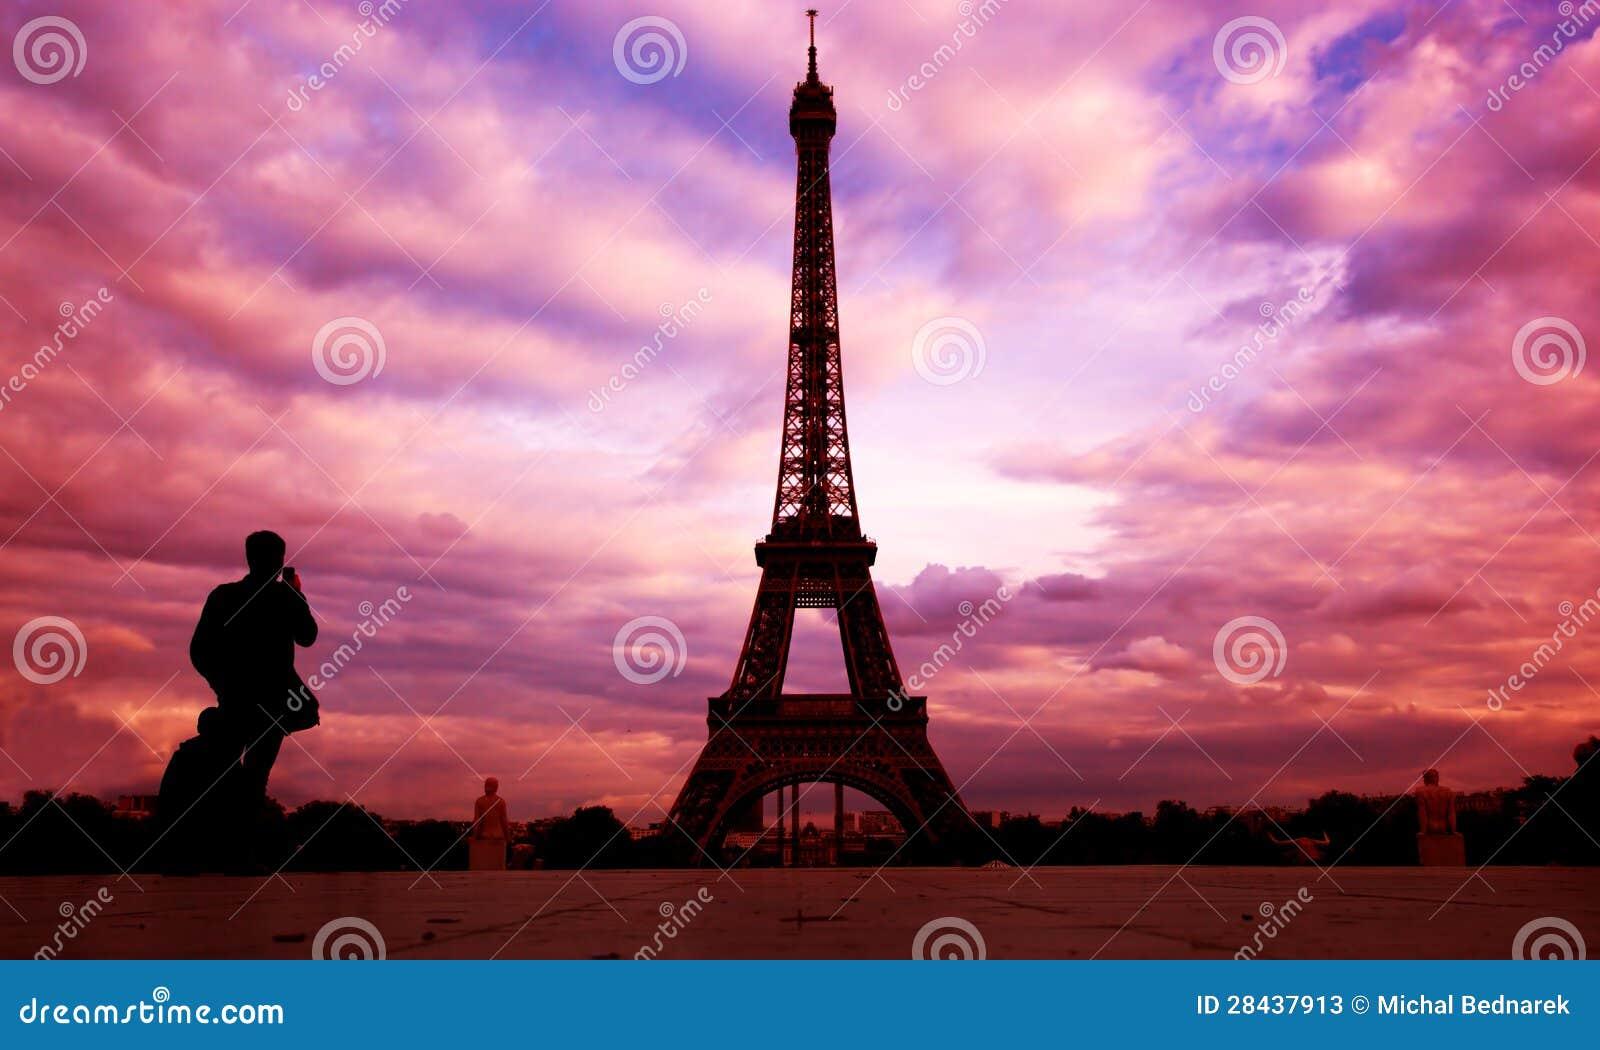 Eiffel tower paris fance at sunset stock photos image 28437913 - Landscaping parijs ...